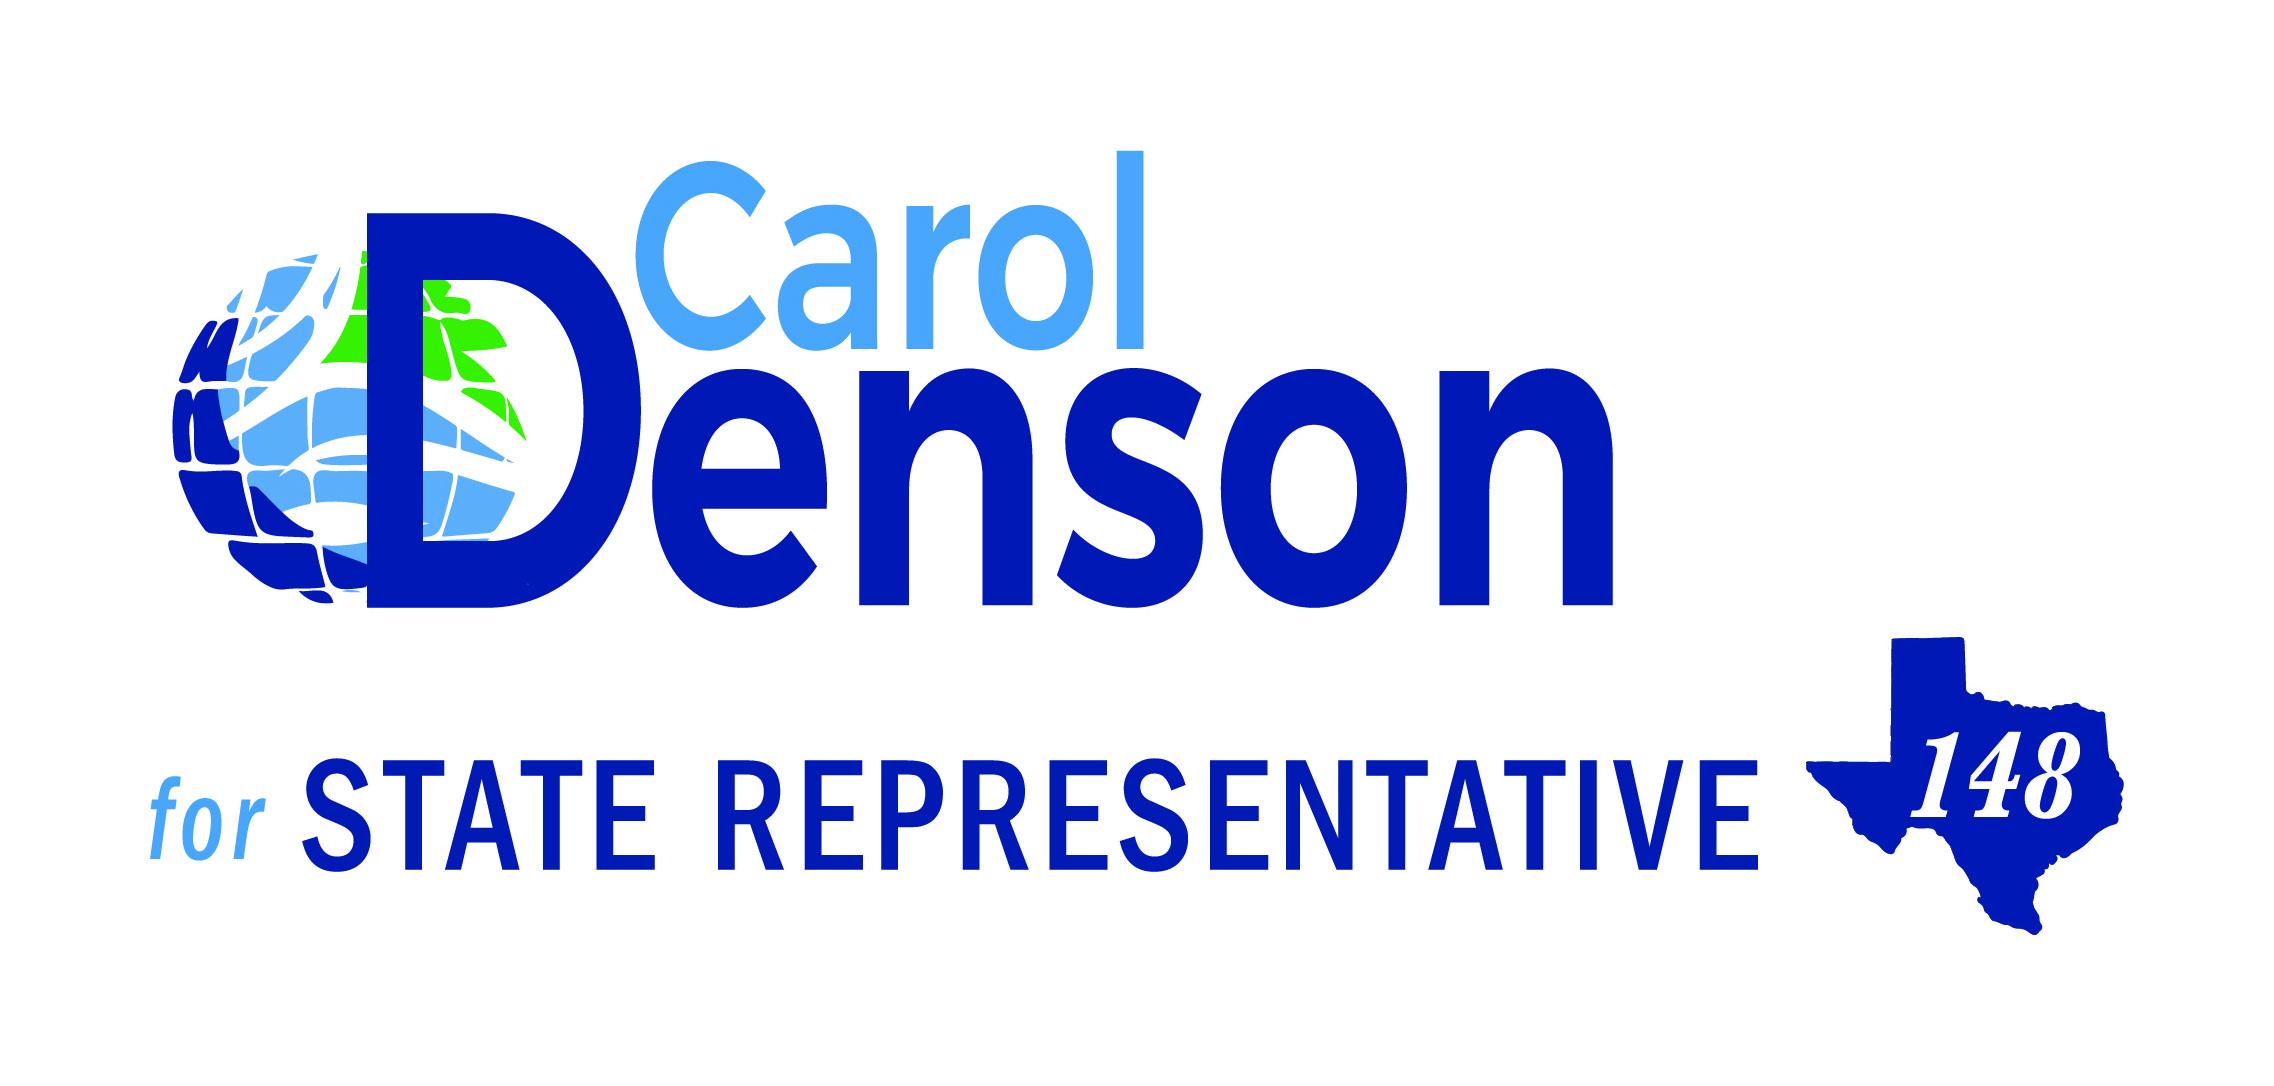 Carol Denson